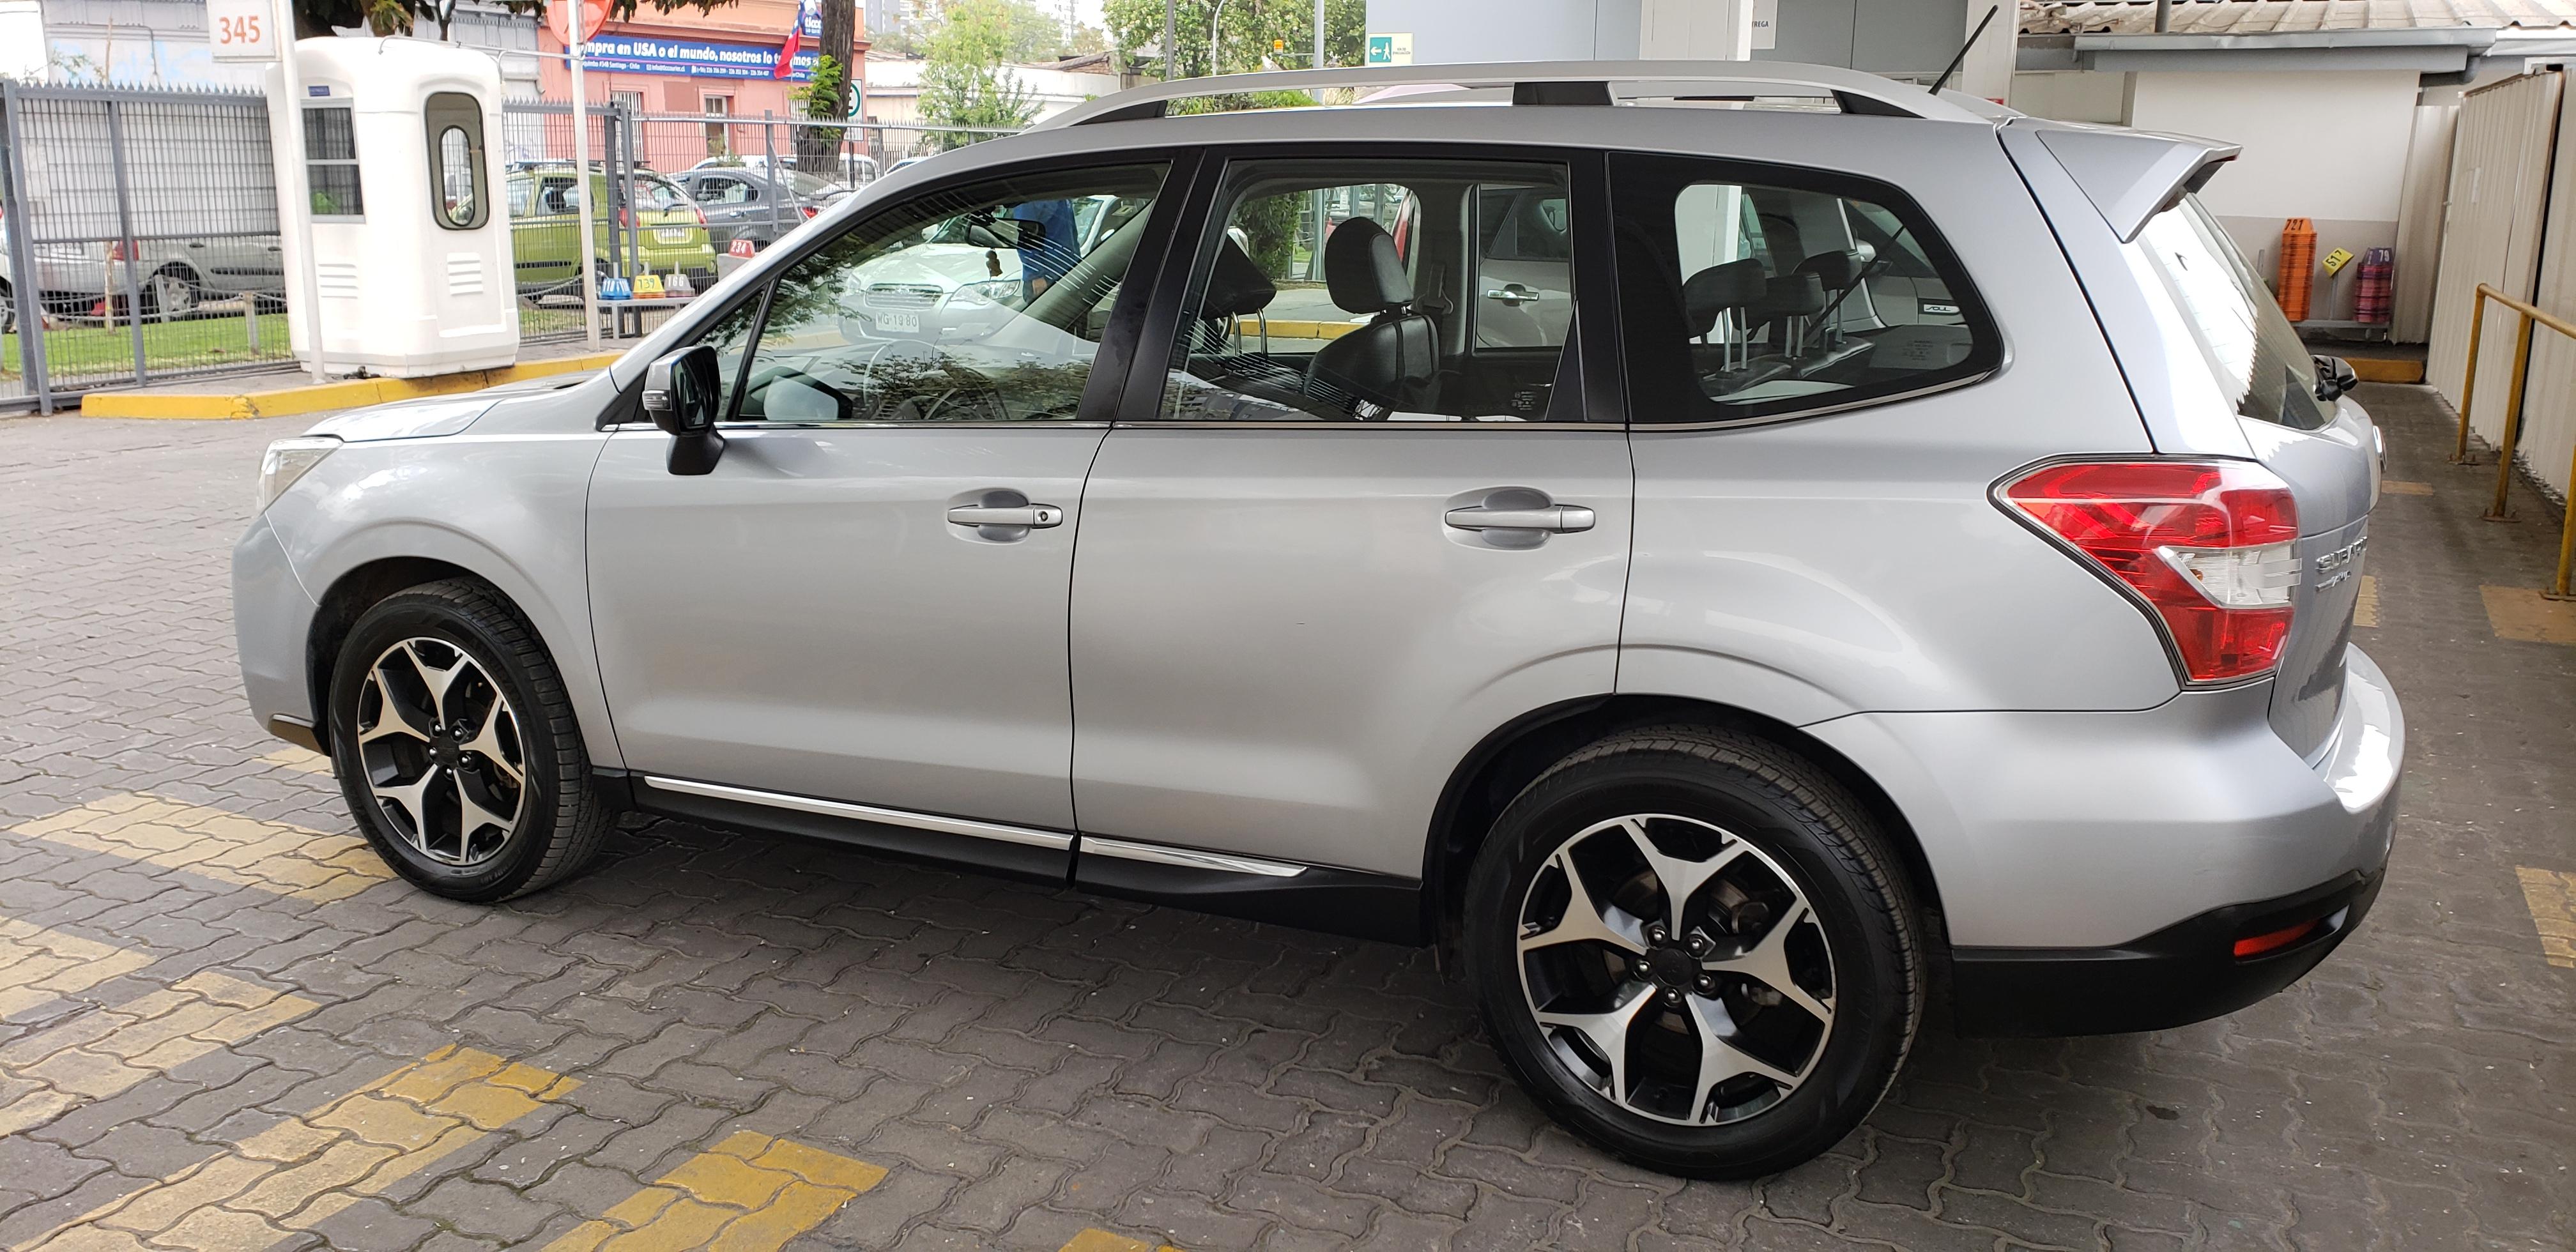 Subaru Forester XT TURBO AWD CVT 2.0 full equipo año 2013